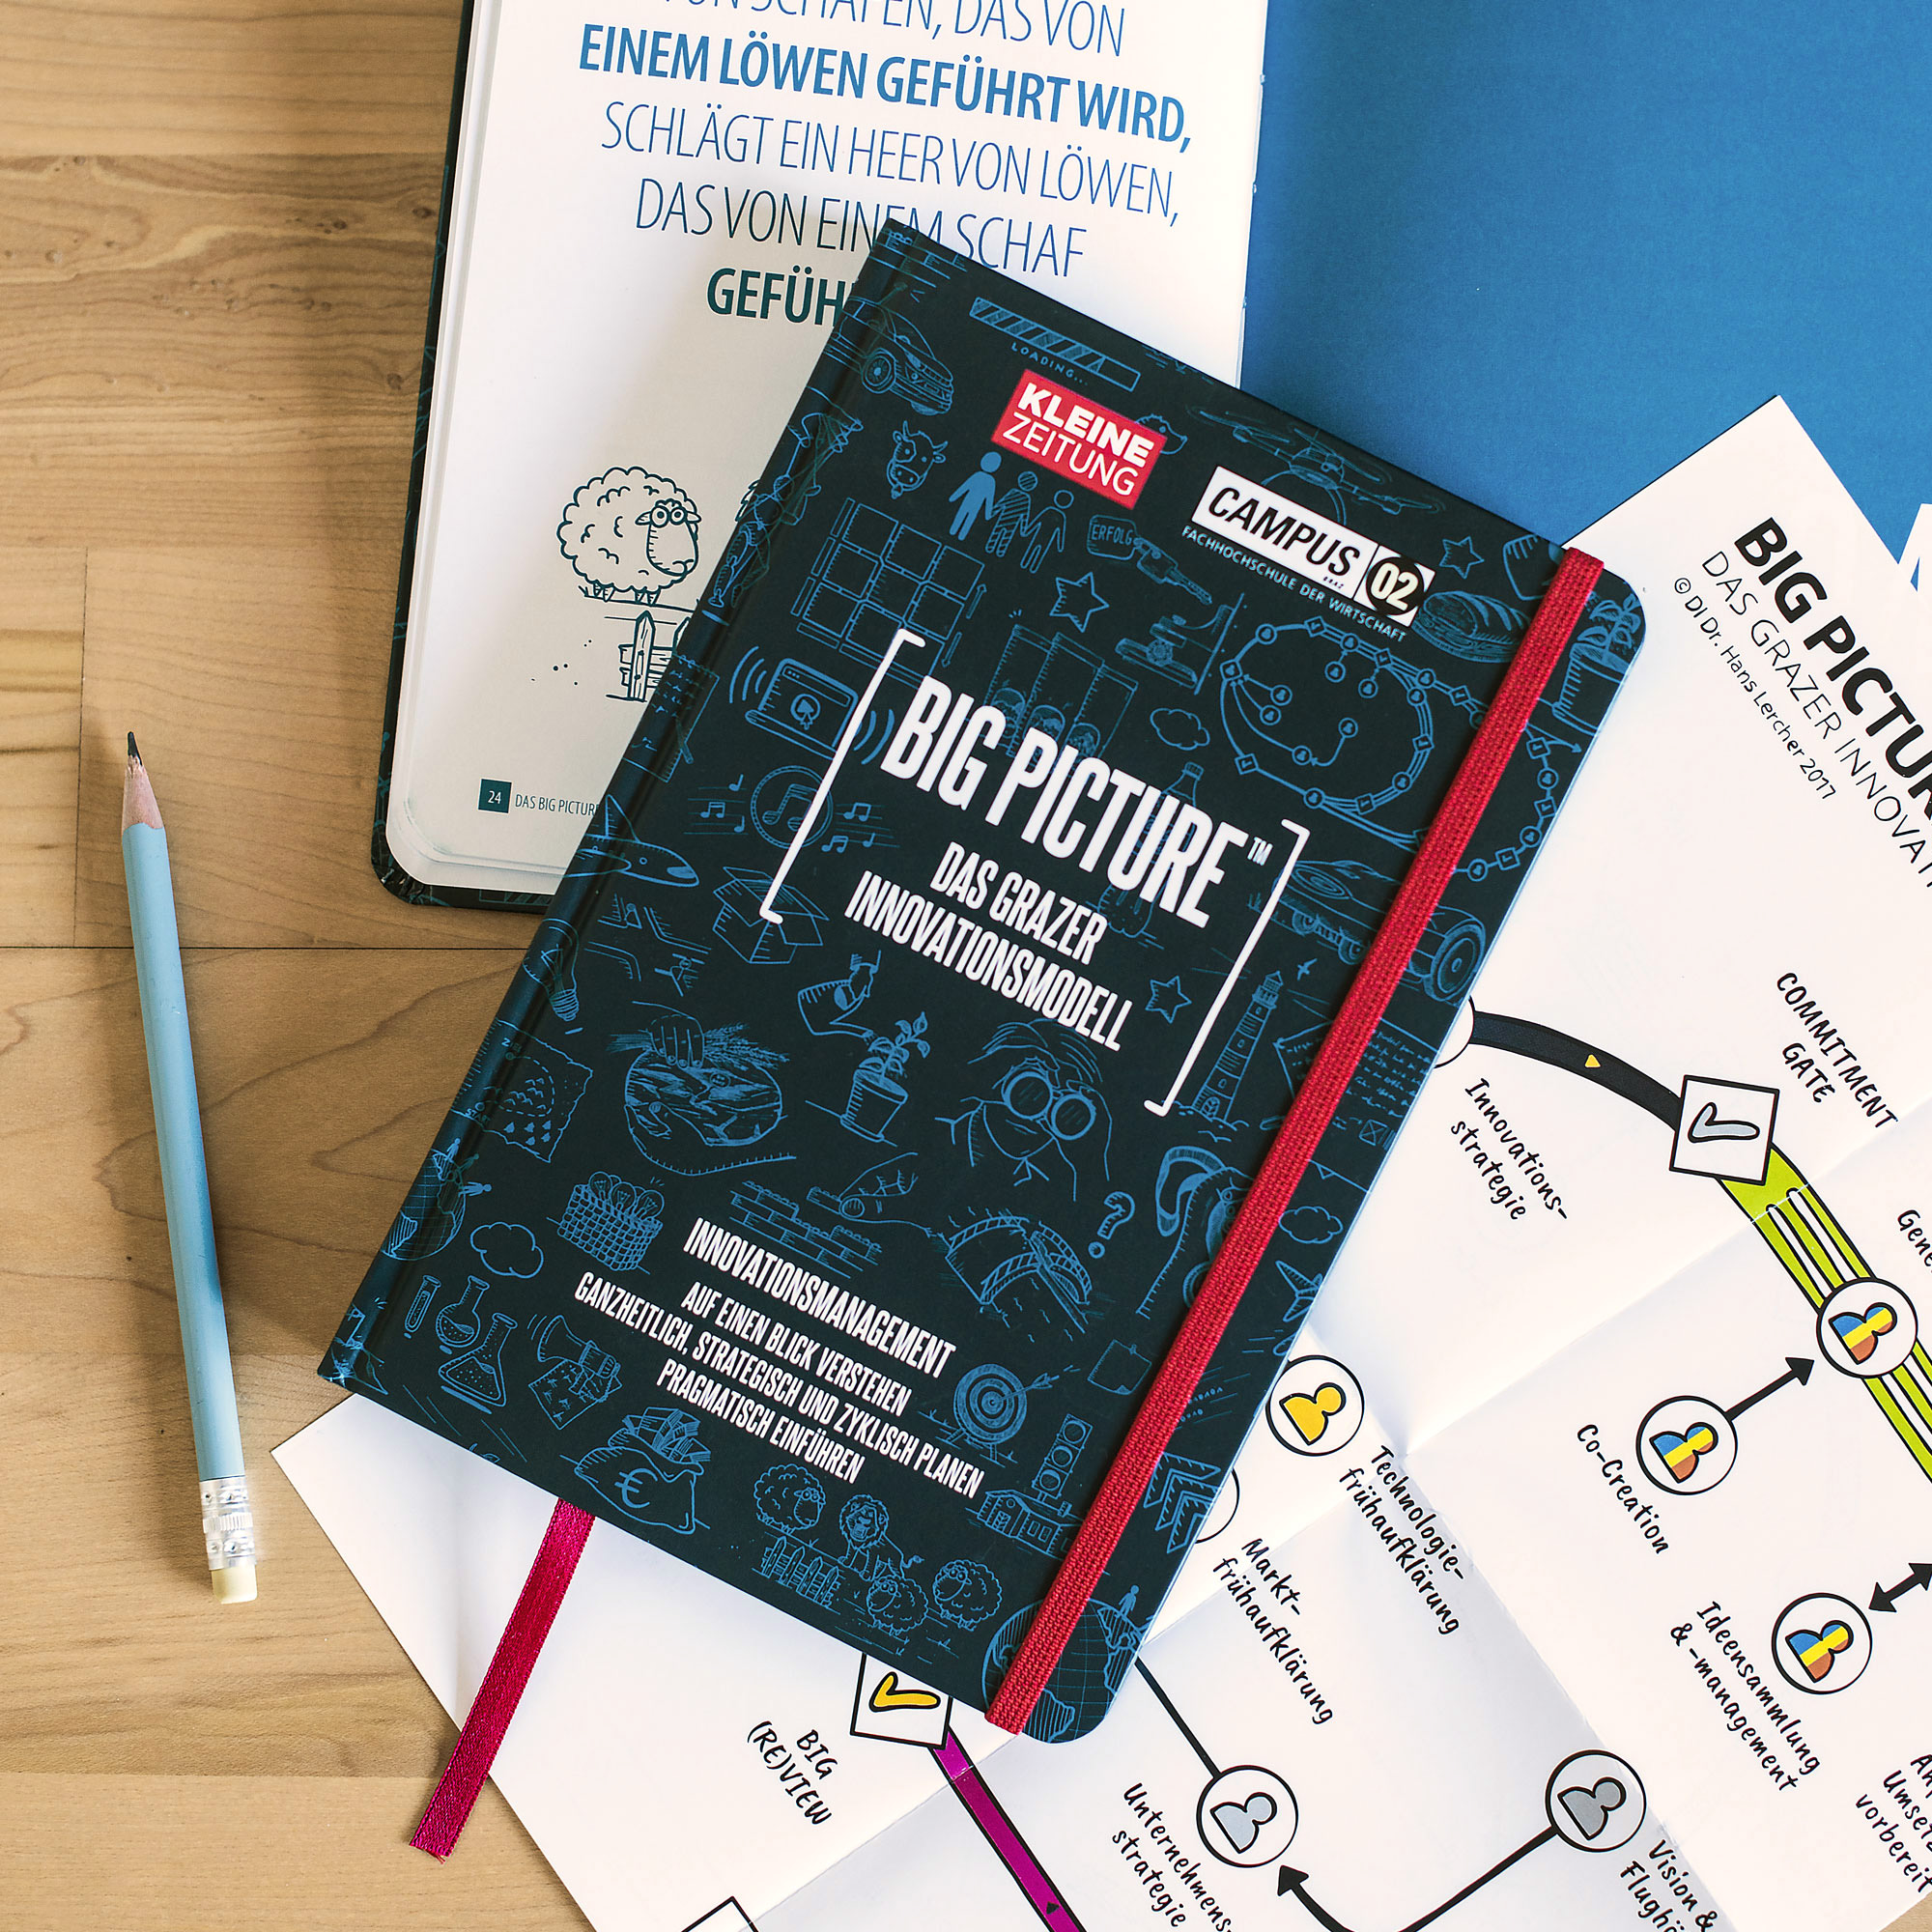 BIG-Picuture-Pocketbuch-1.jpg